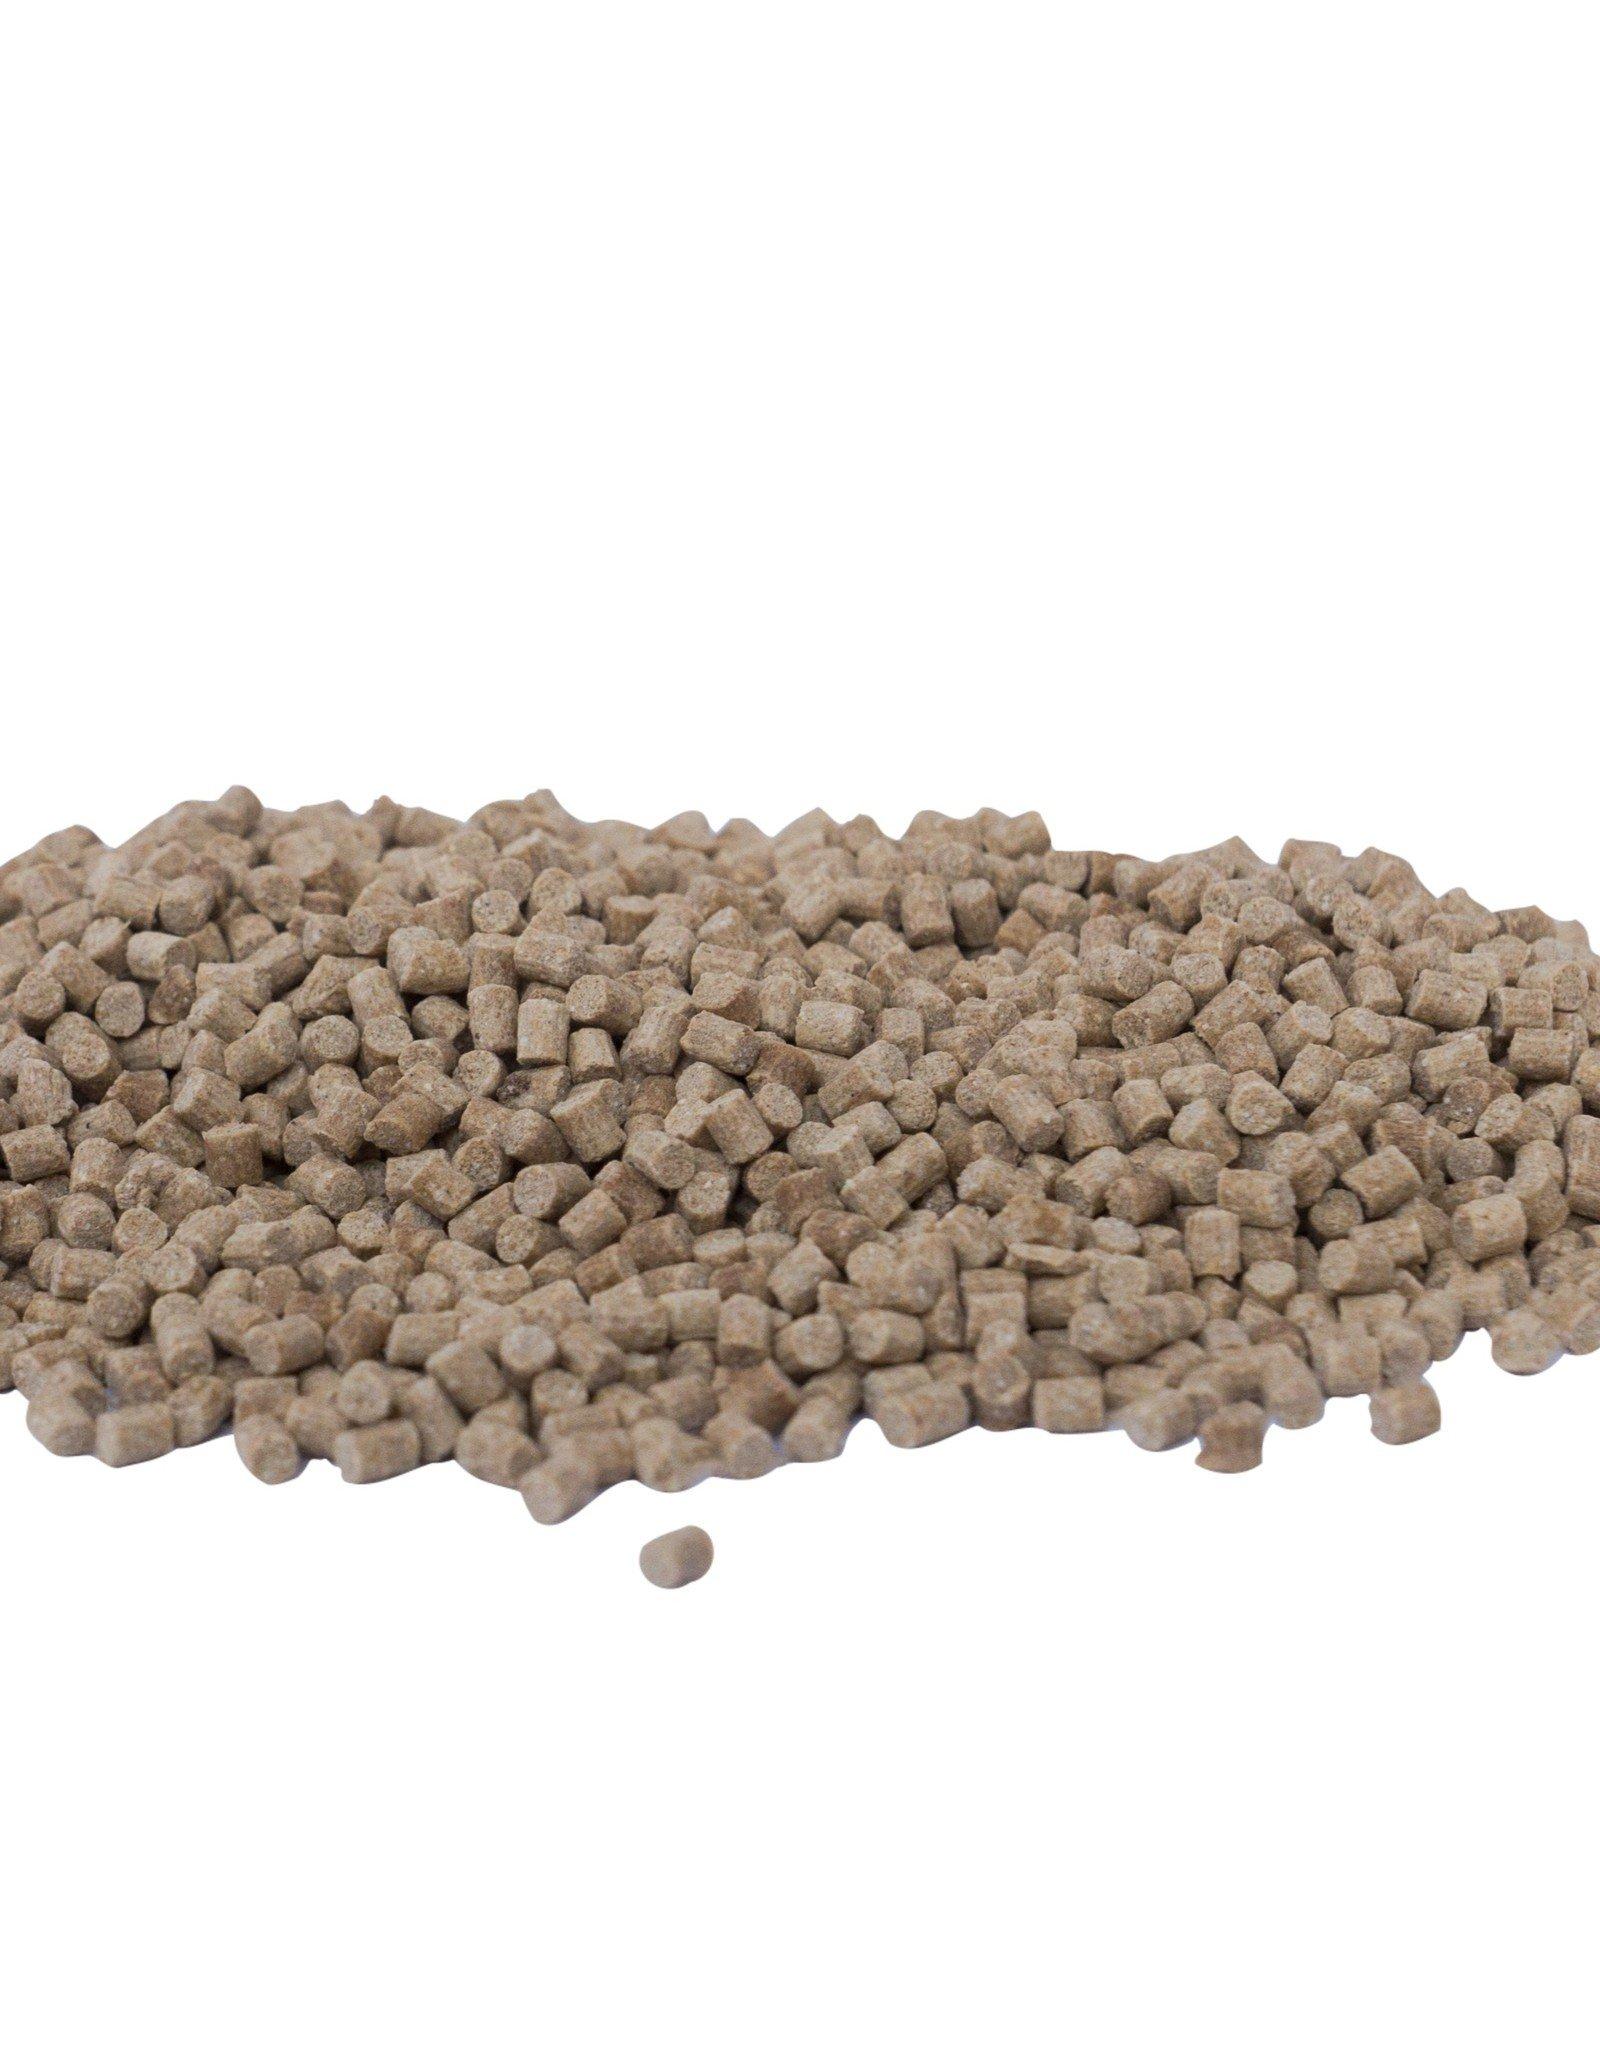 Baitworld Baitworld Premium Carp pellets 3mm 5kg